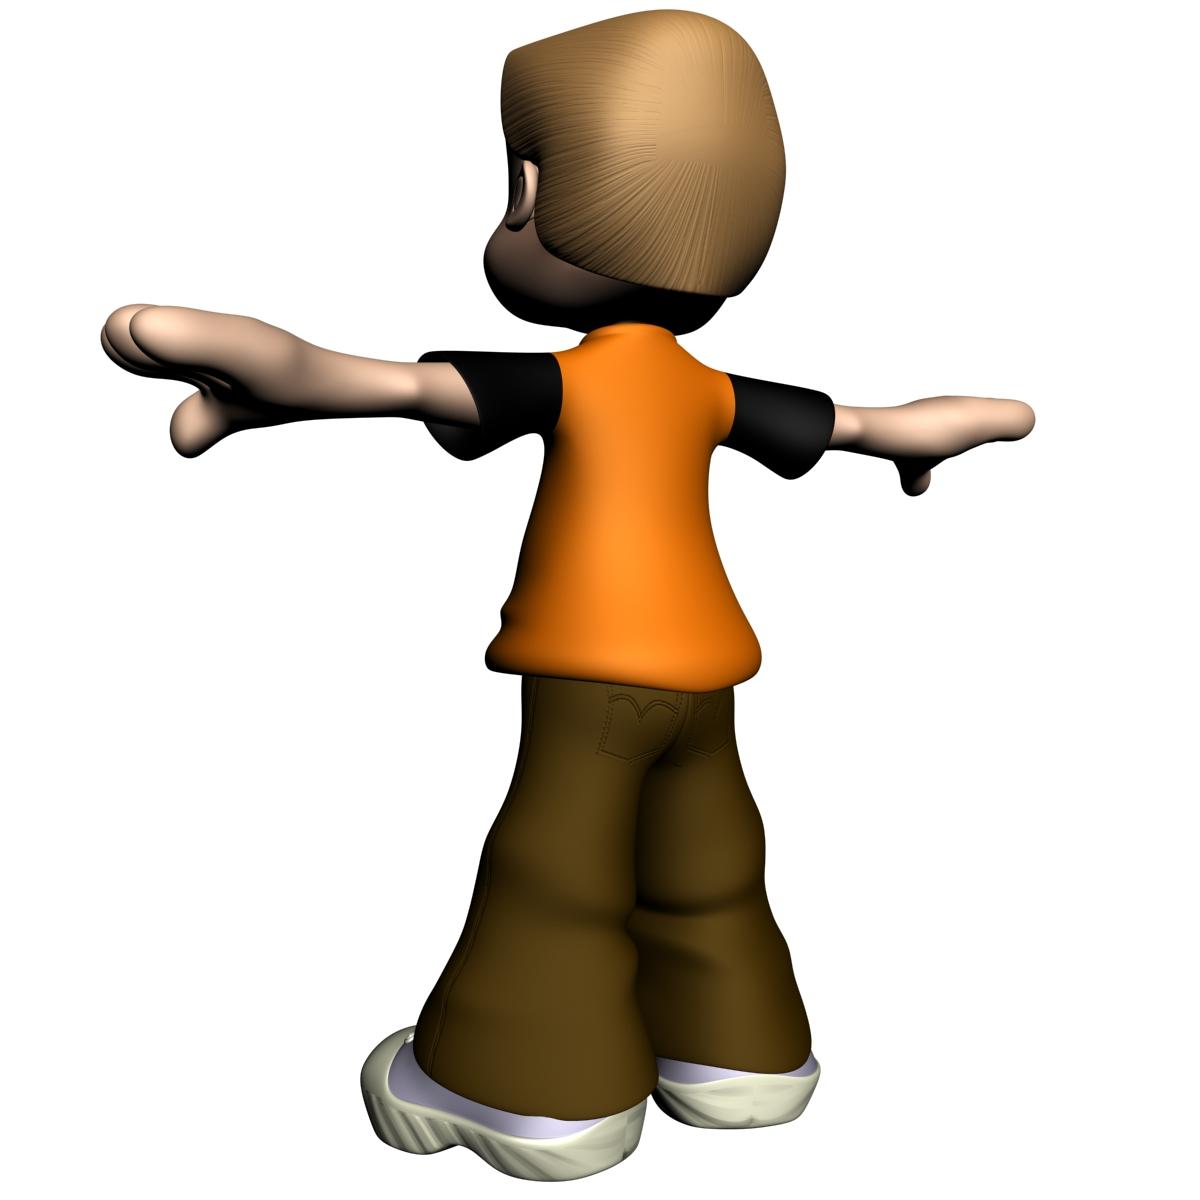 cartoon boy rigged 20739kb jpg by supercigale - Cartoon Boy Images Free